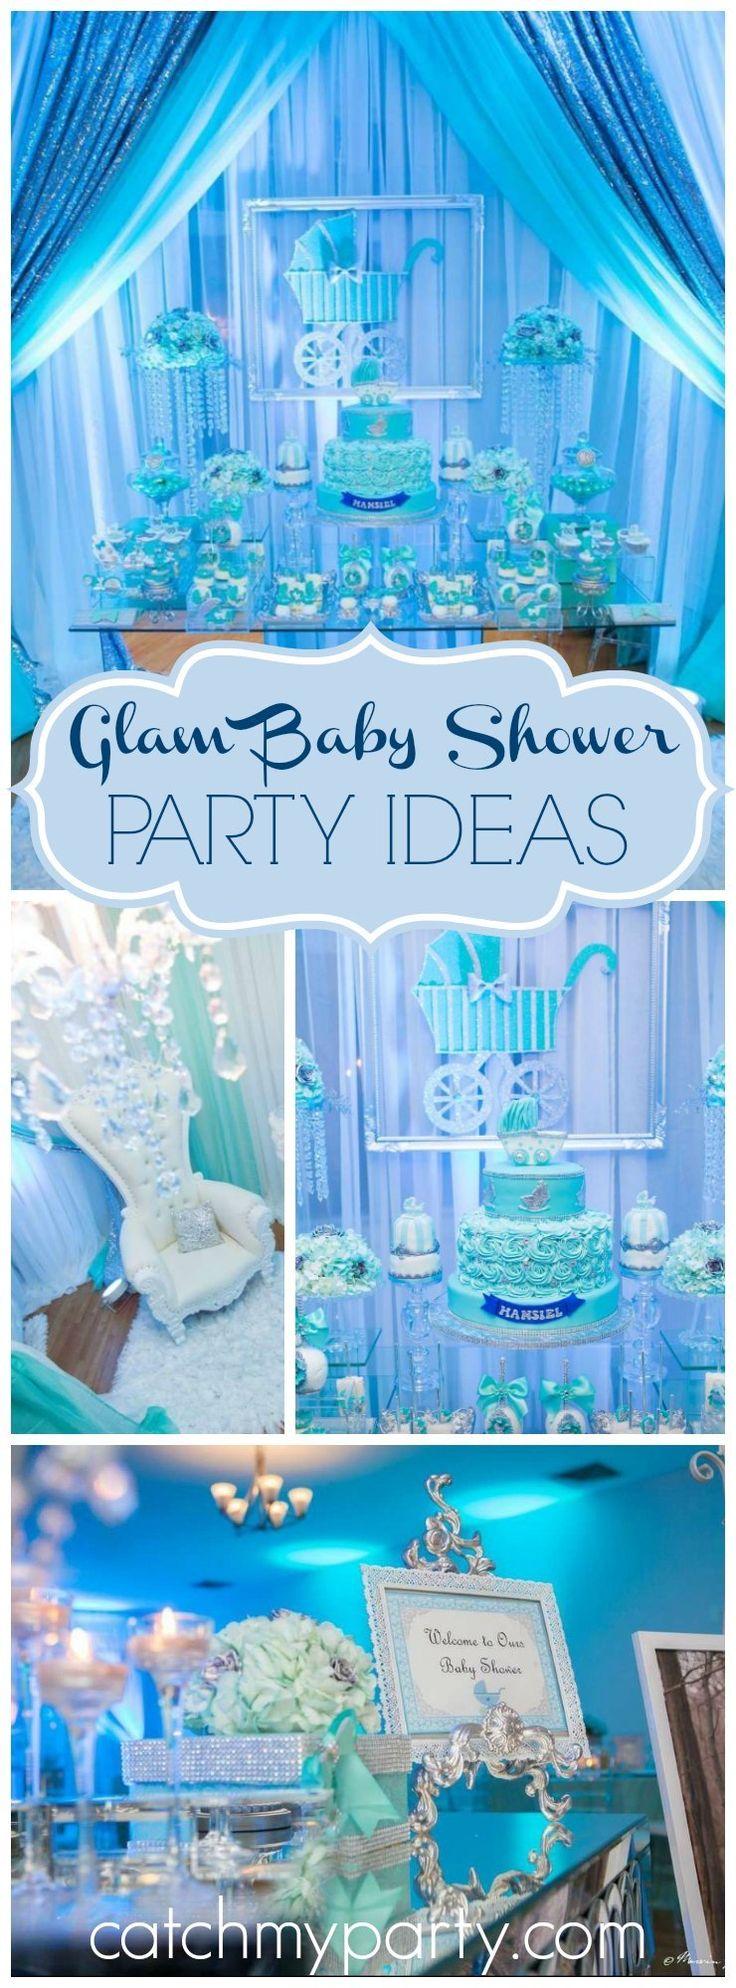 Best 25+ White baby showers ideas on Pinterest ...